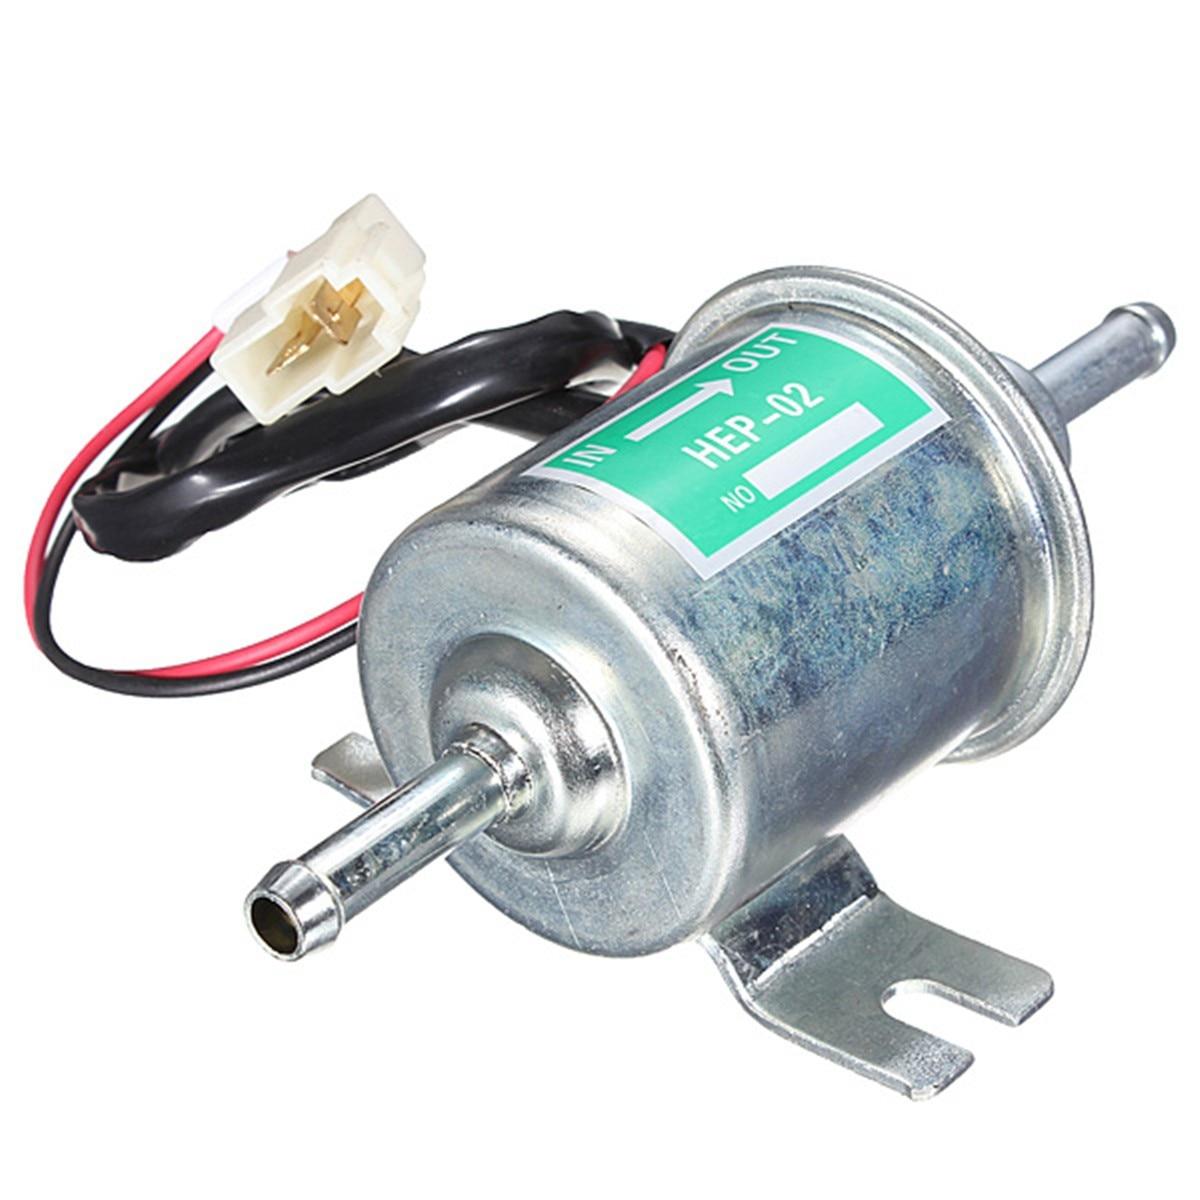 12v 8mm universal for diesel petrol gasoline electric fuel pump hep 02a low pressure fuel pump. Black Bedroom Furniture Sets. Home Design Ideas